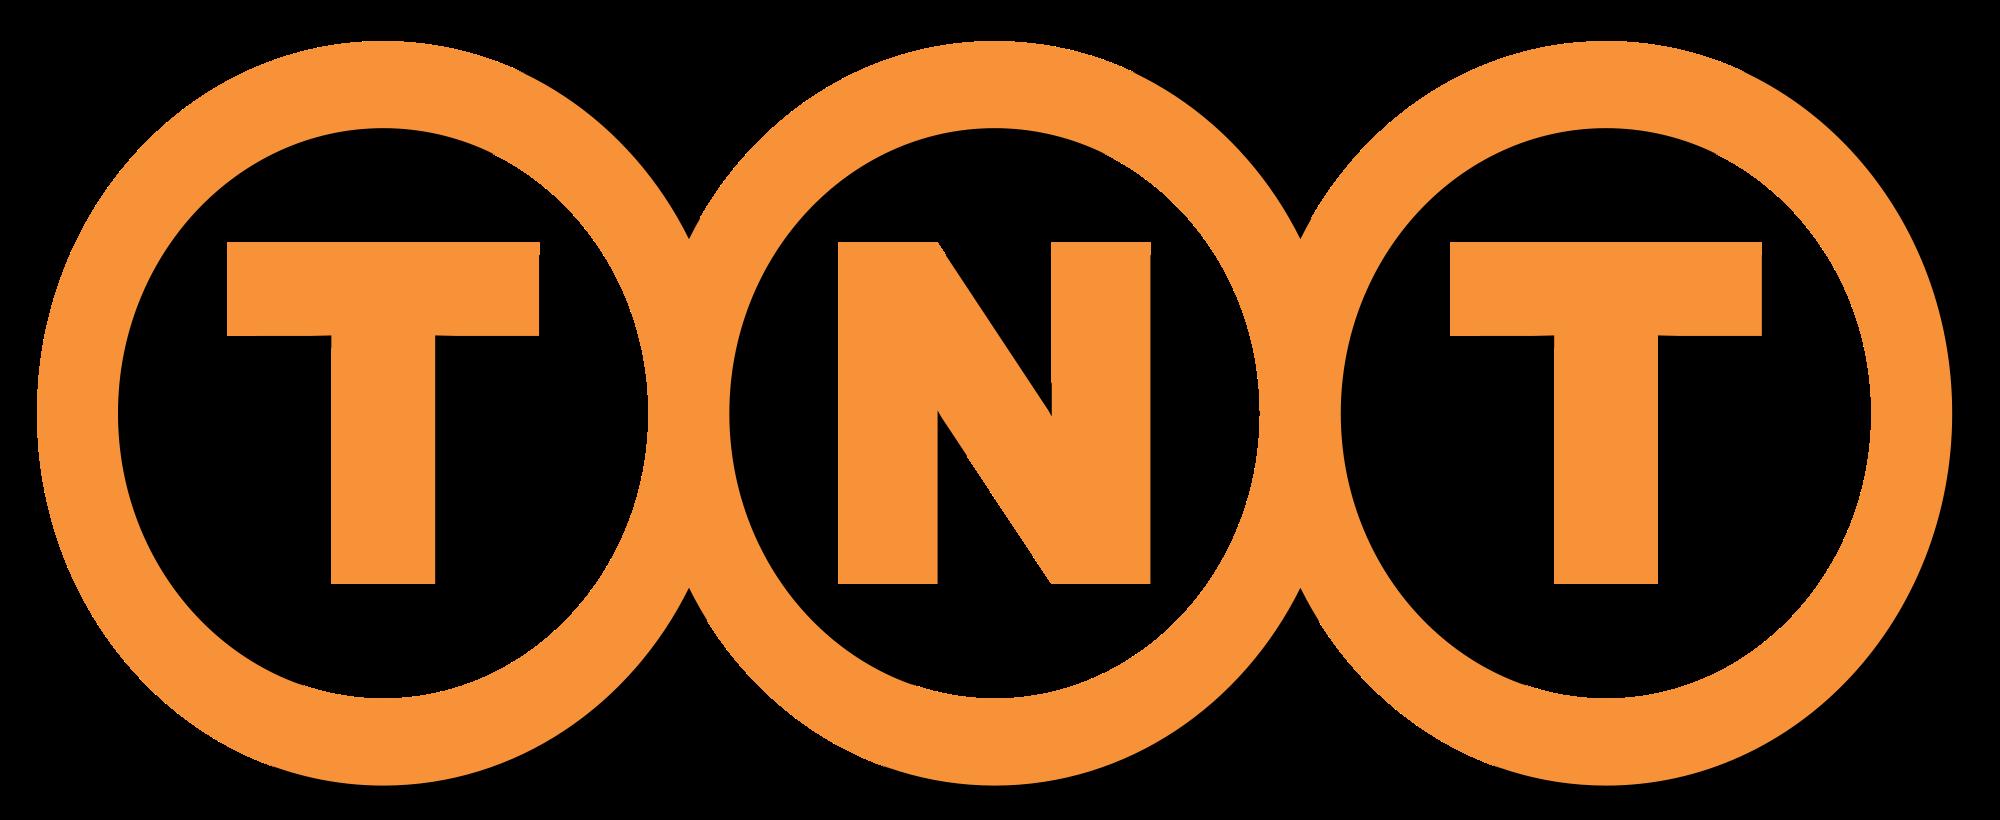 tnt logo png #813